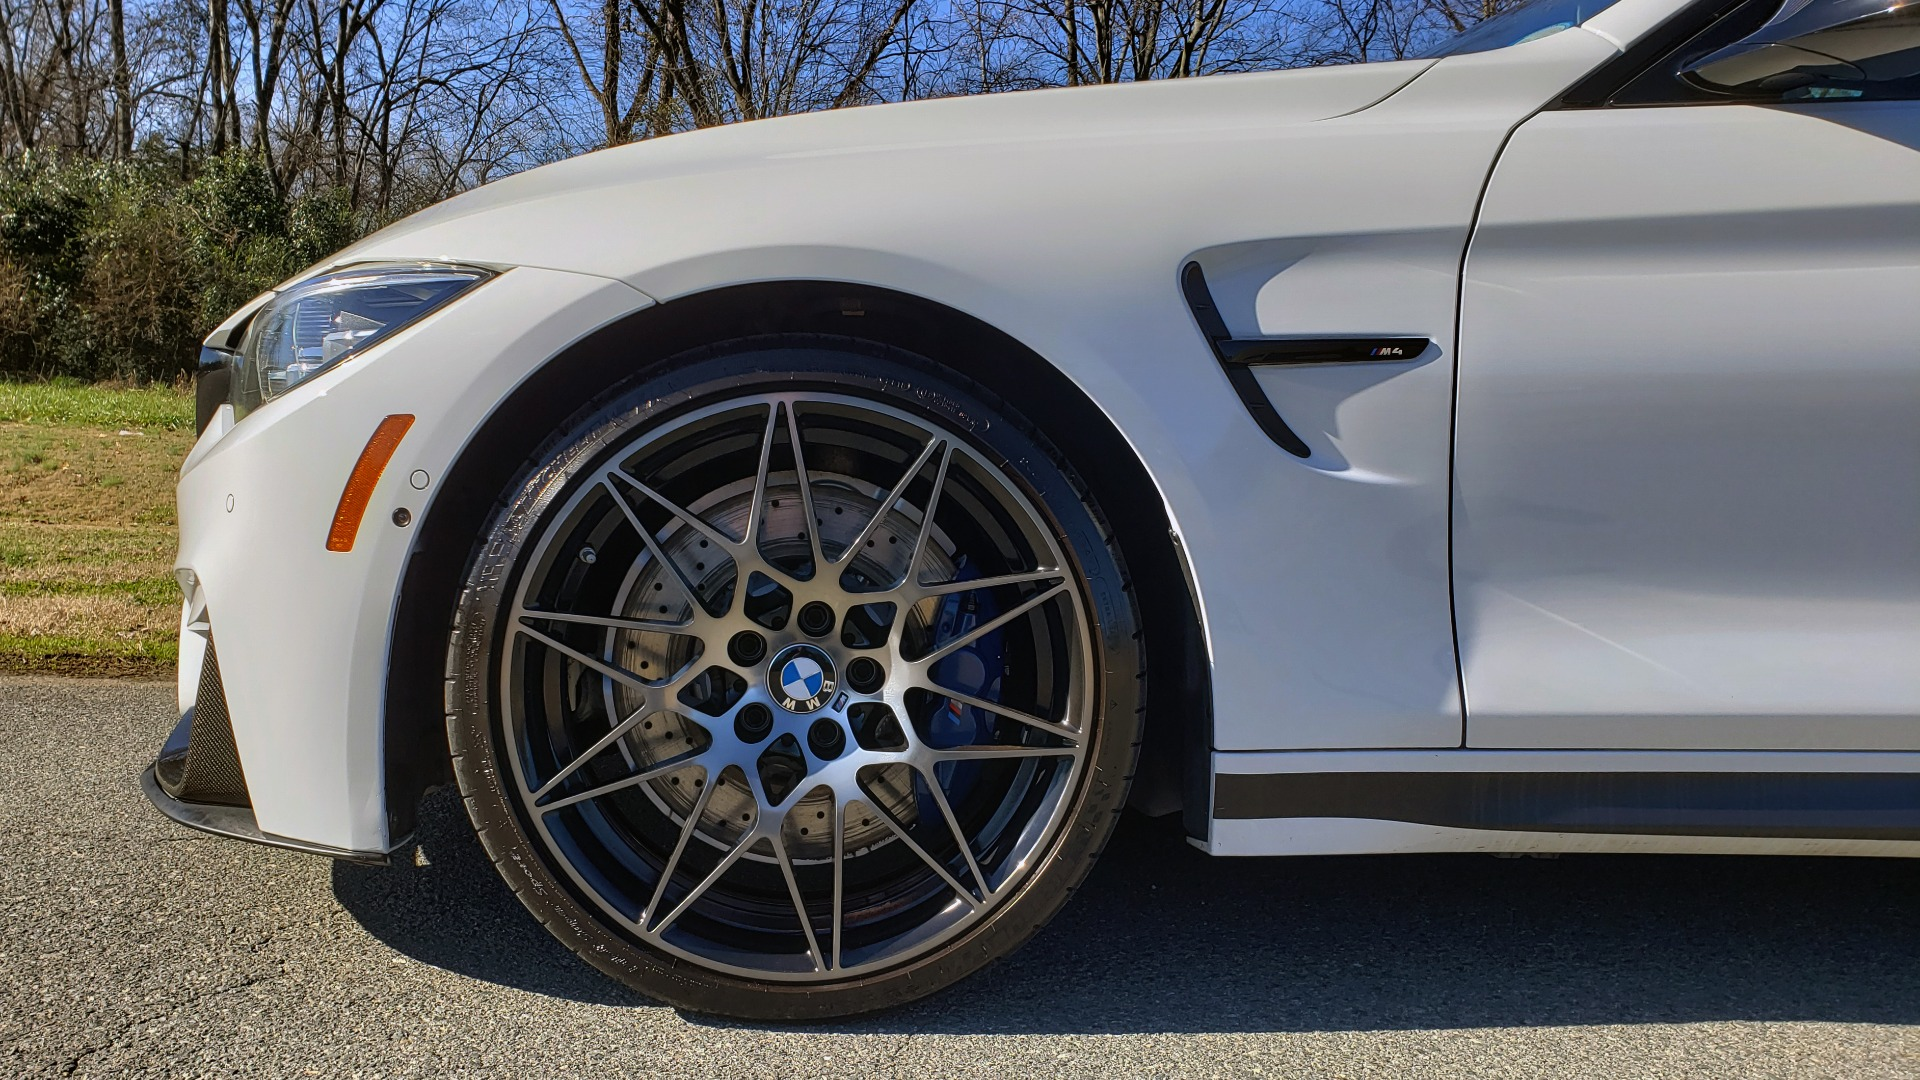 Used 2018 BMW M4 COMP PKG / EXEC / M-DRIVER / PARK CNTRL / ACTIVE BLIND SPOT for sale Sold at Formula Imports in Charlotte NC 28227 74